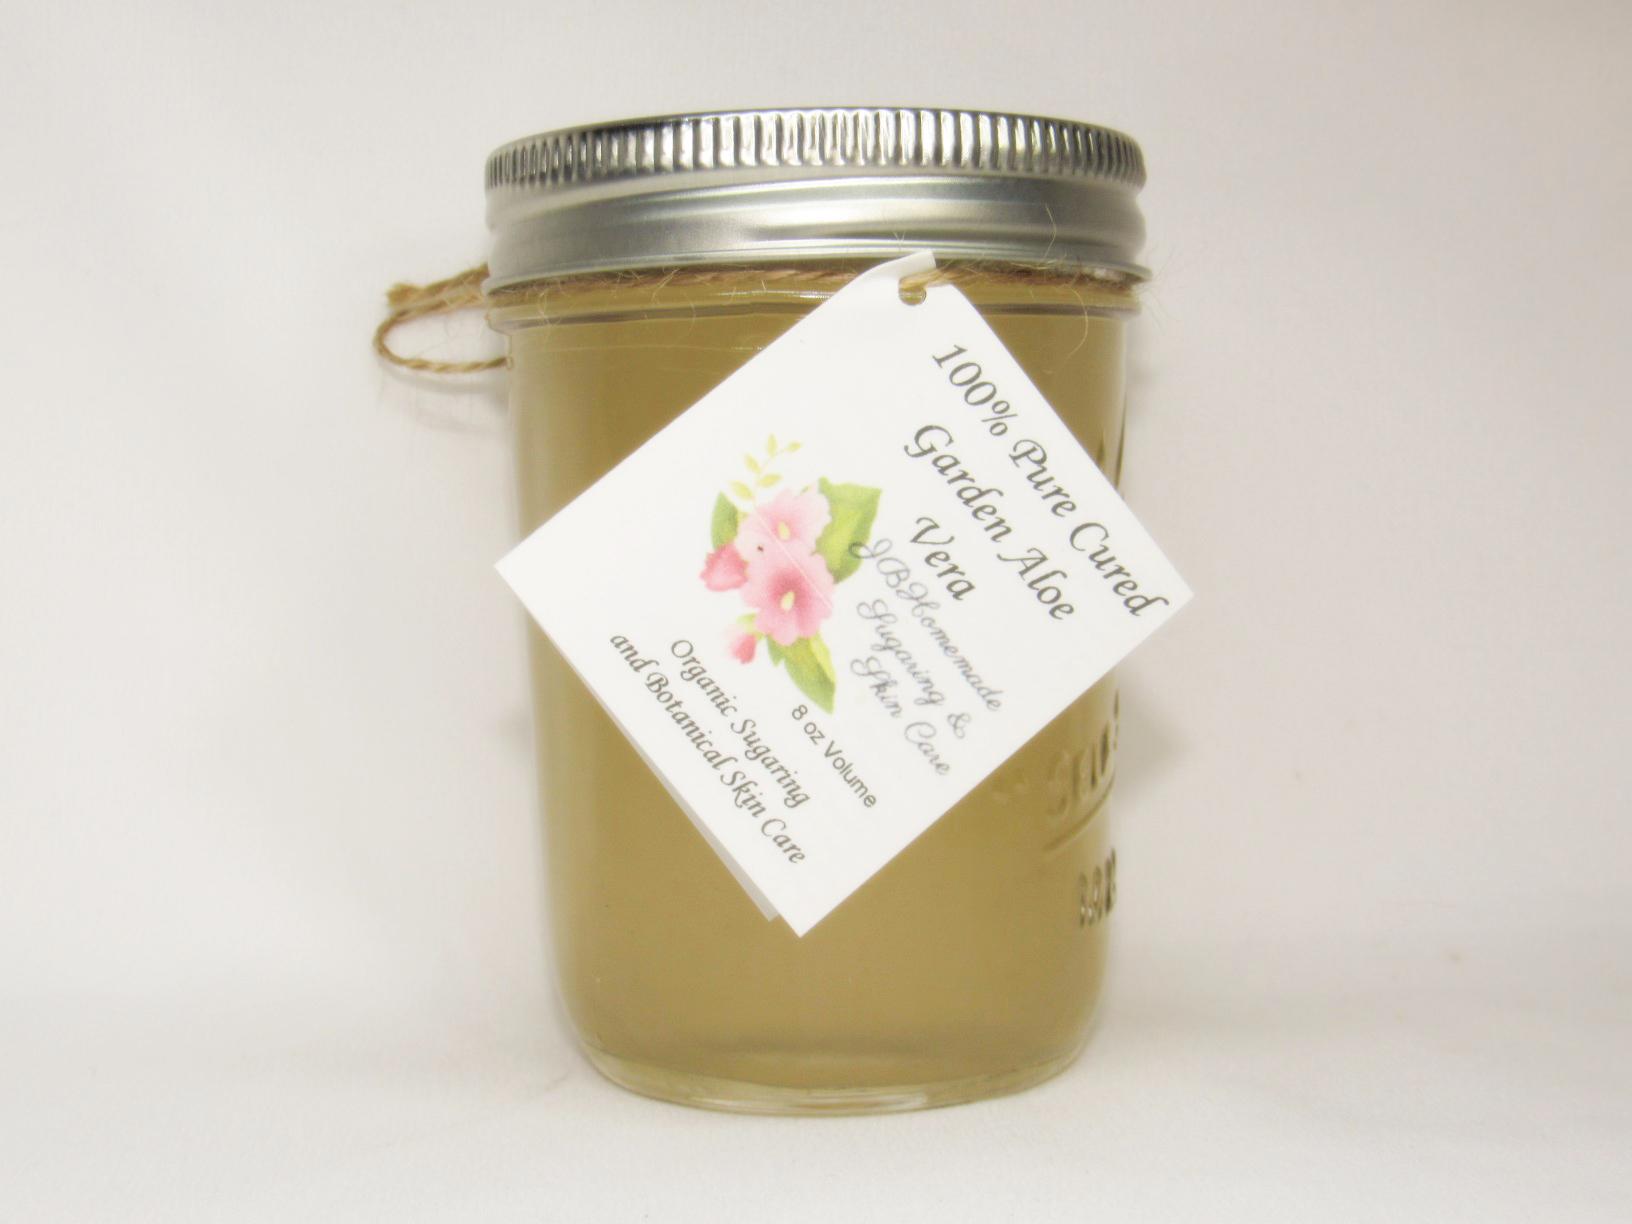 Pure CURED ALOE - 100% Pure Soothing Aloe Vera- 4 Oz